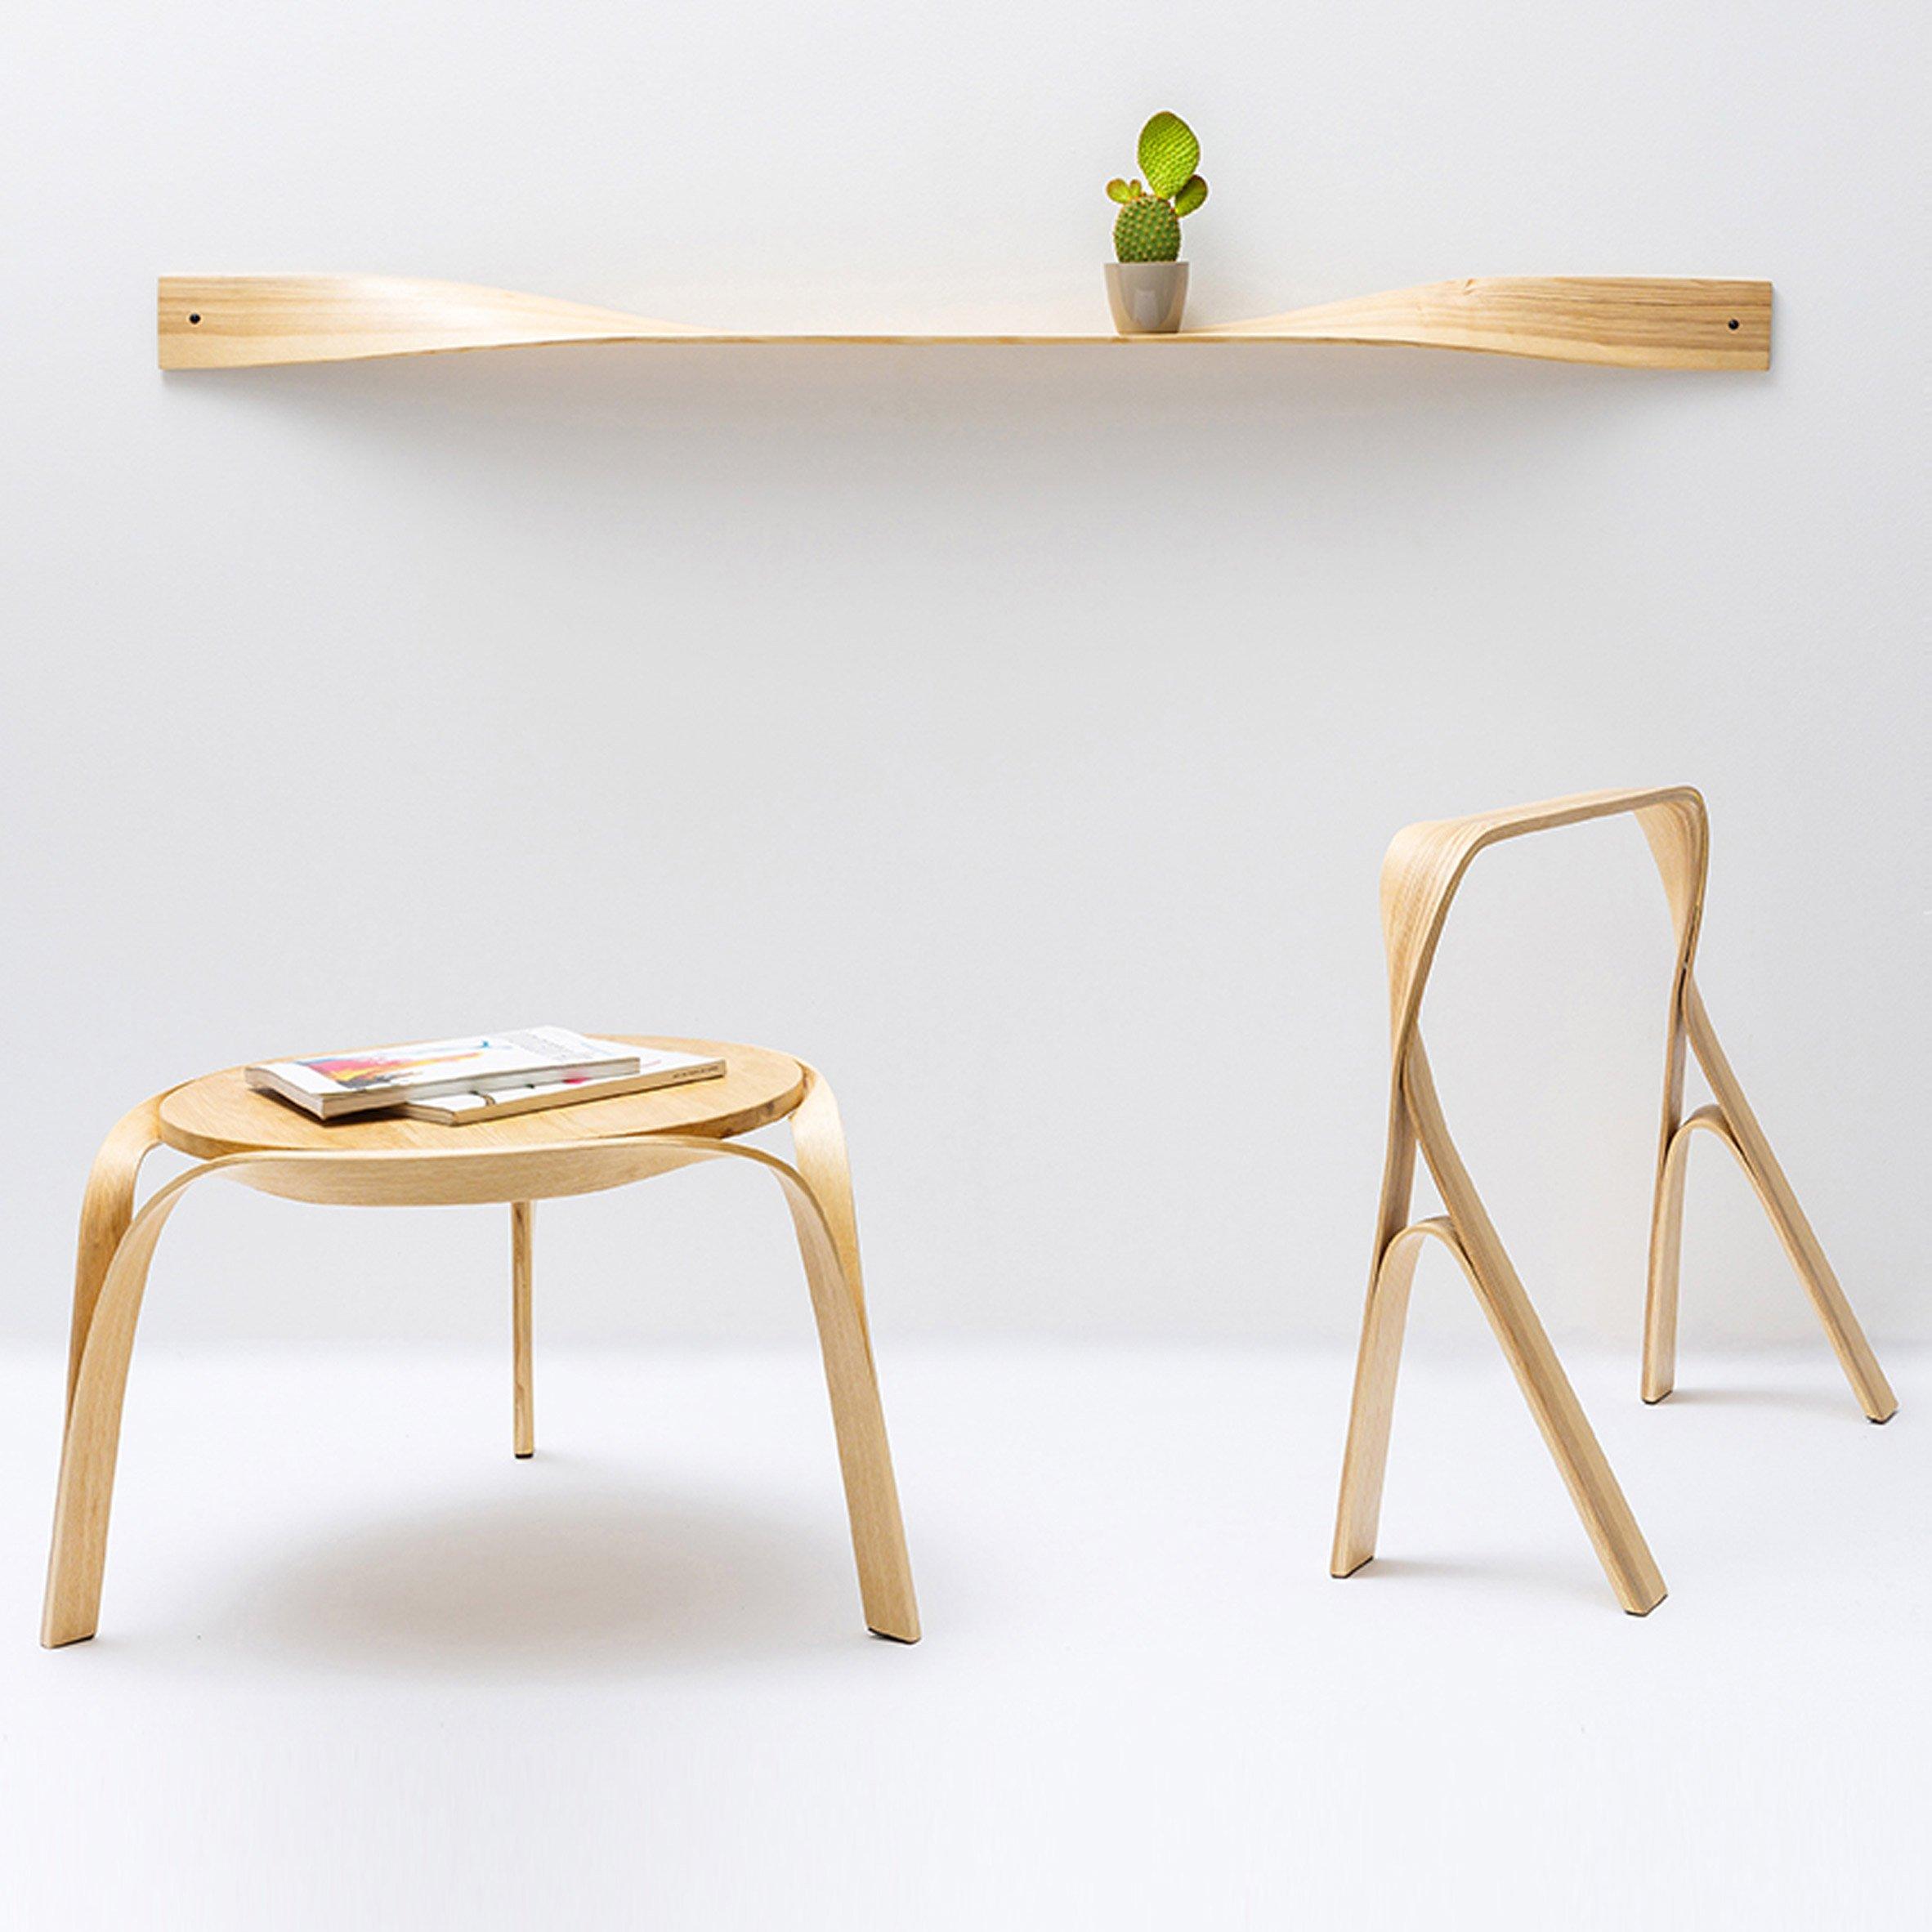 Bar Gantz uses steam-bending to create twisted wood furniture